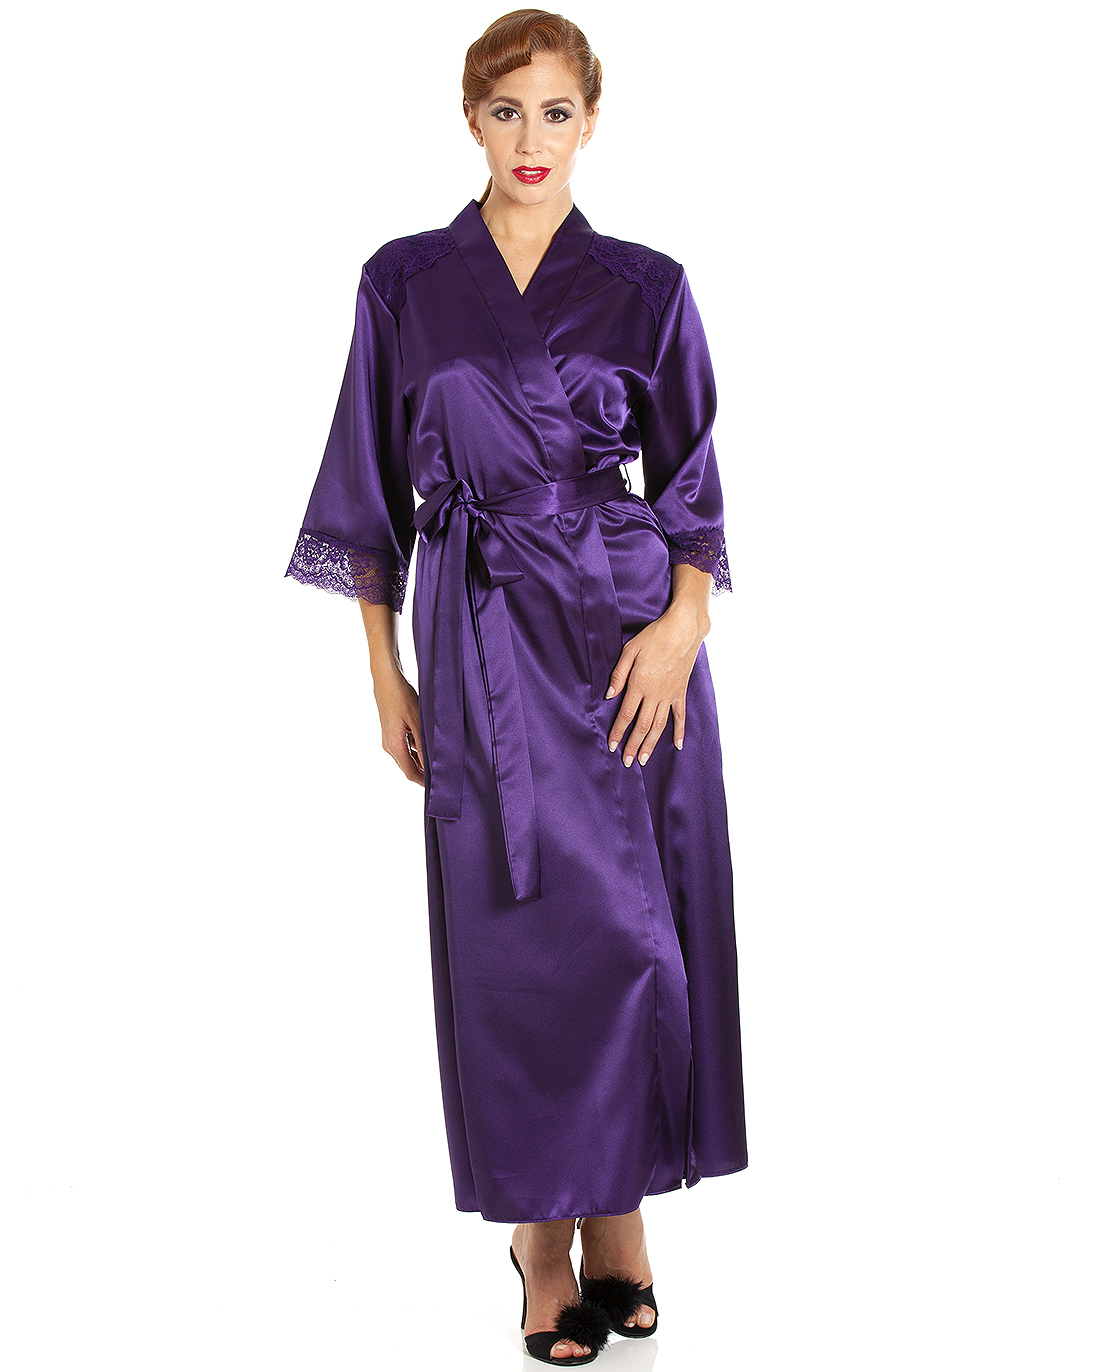 901323747ae Jane Lace Trim Long Satin Robe - Plum Crazy - Cosmic Girl Clothing